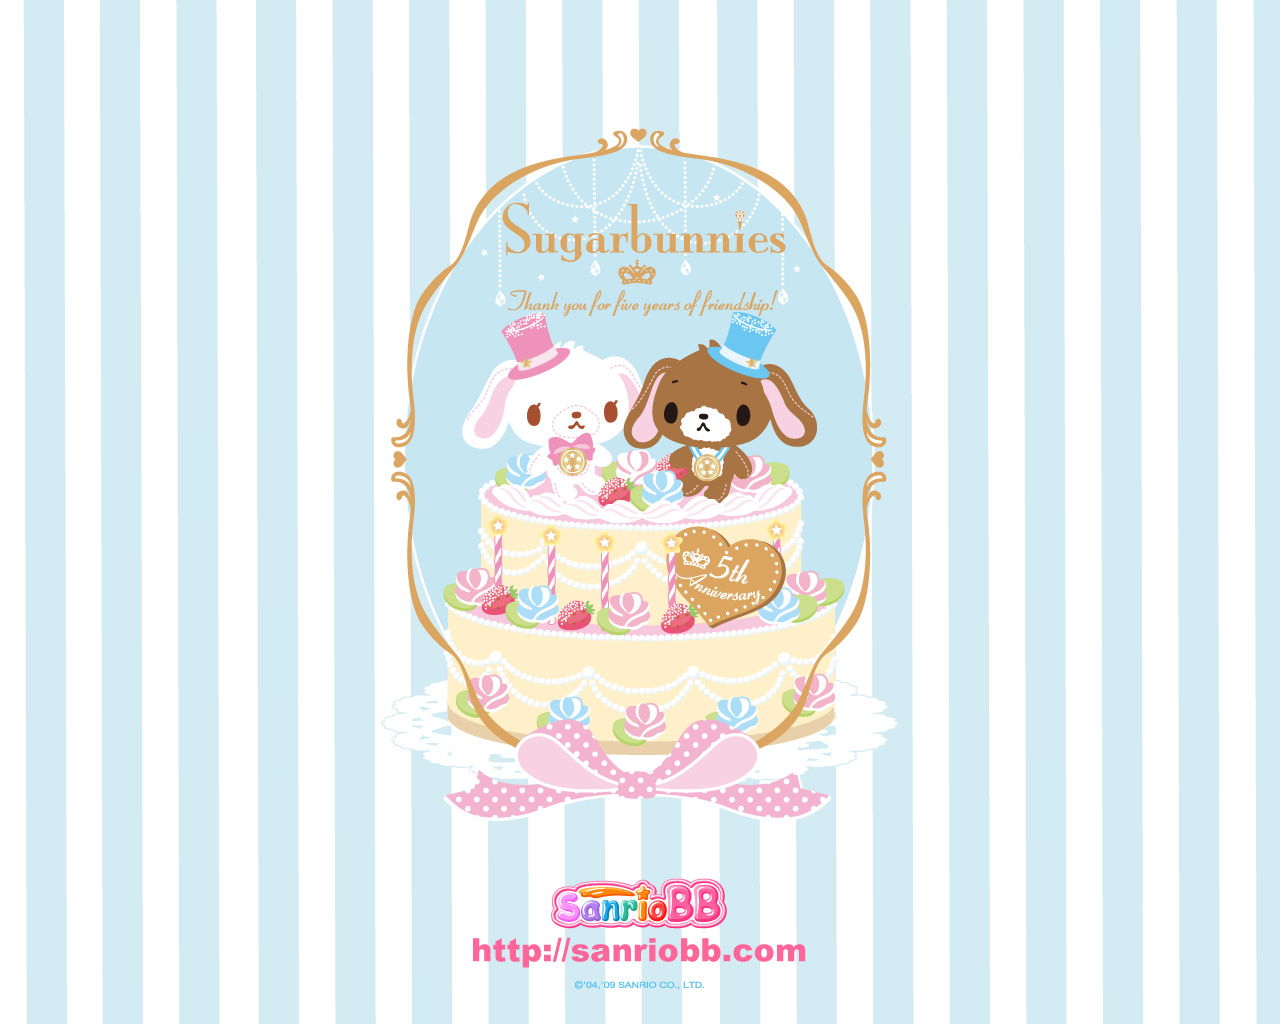 Wallpaper Sugar Bunnies Wallpaper 001 1280x1024